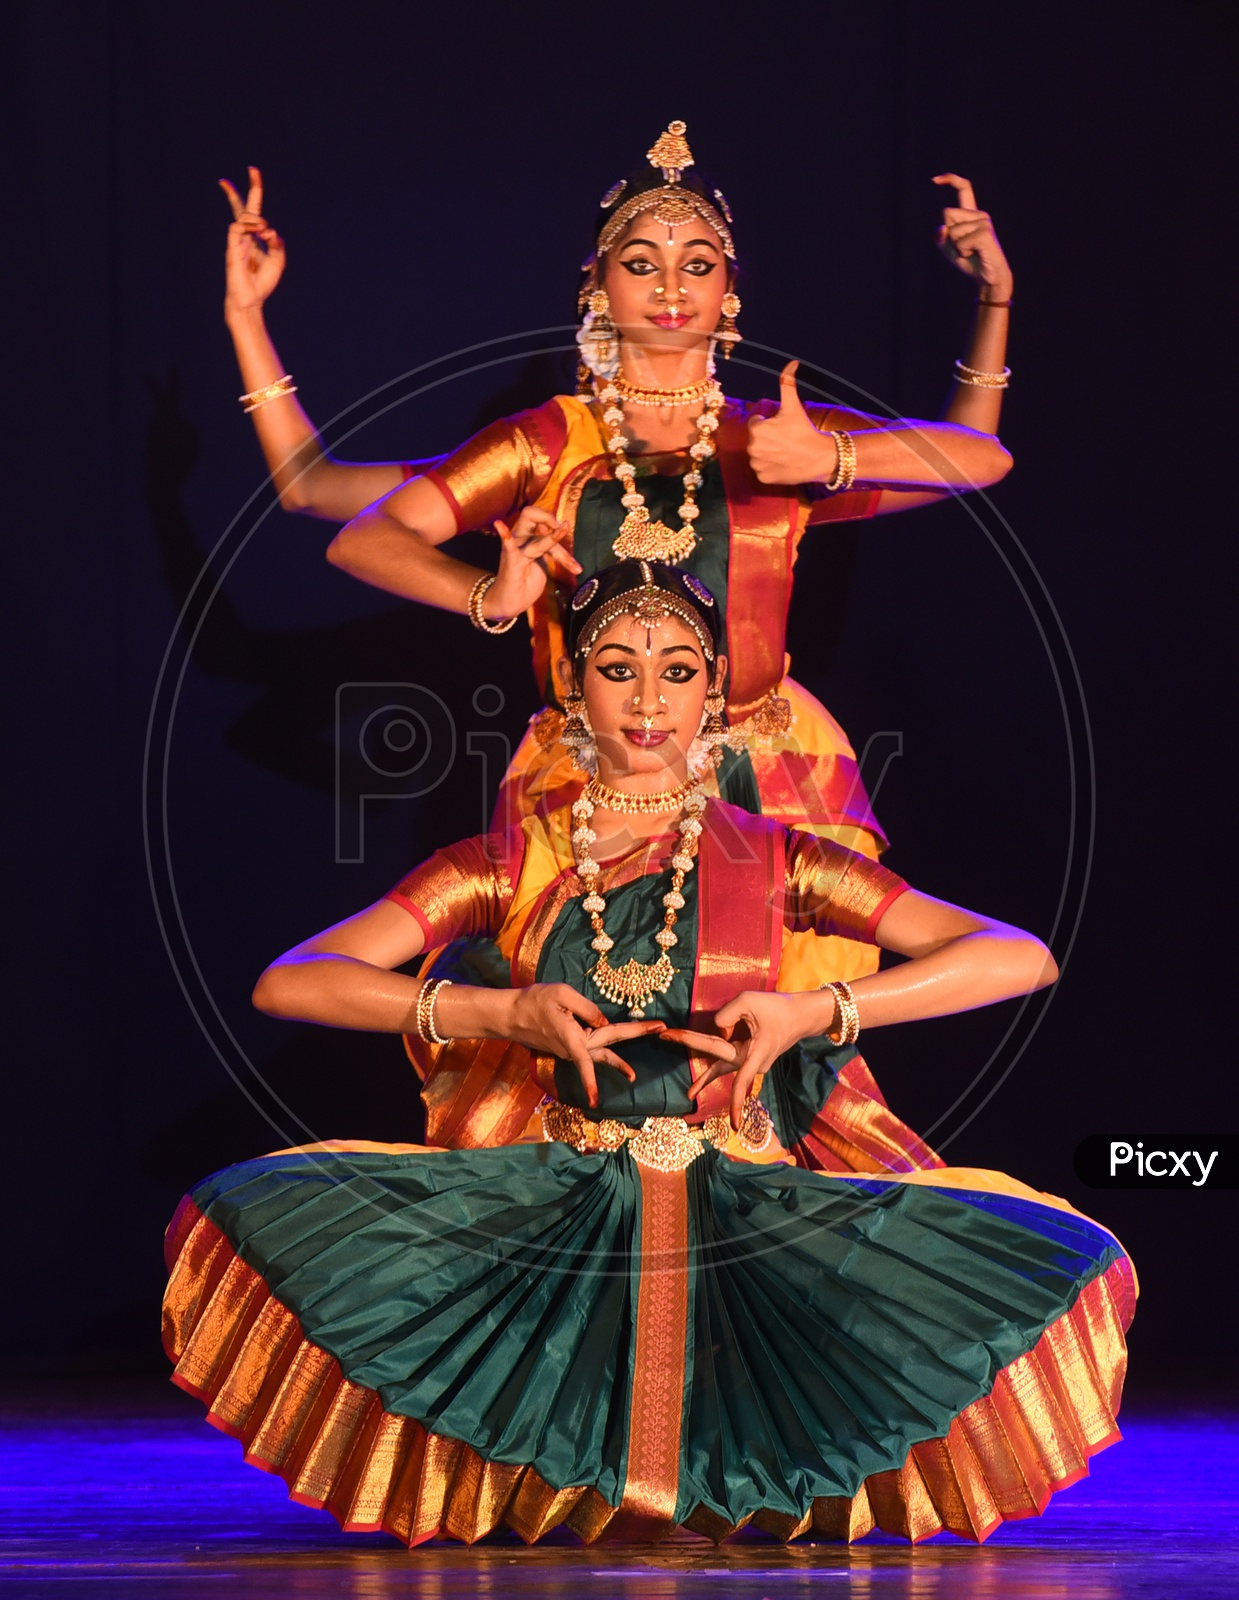 bharatanatyam dancers performing on stage